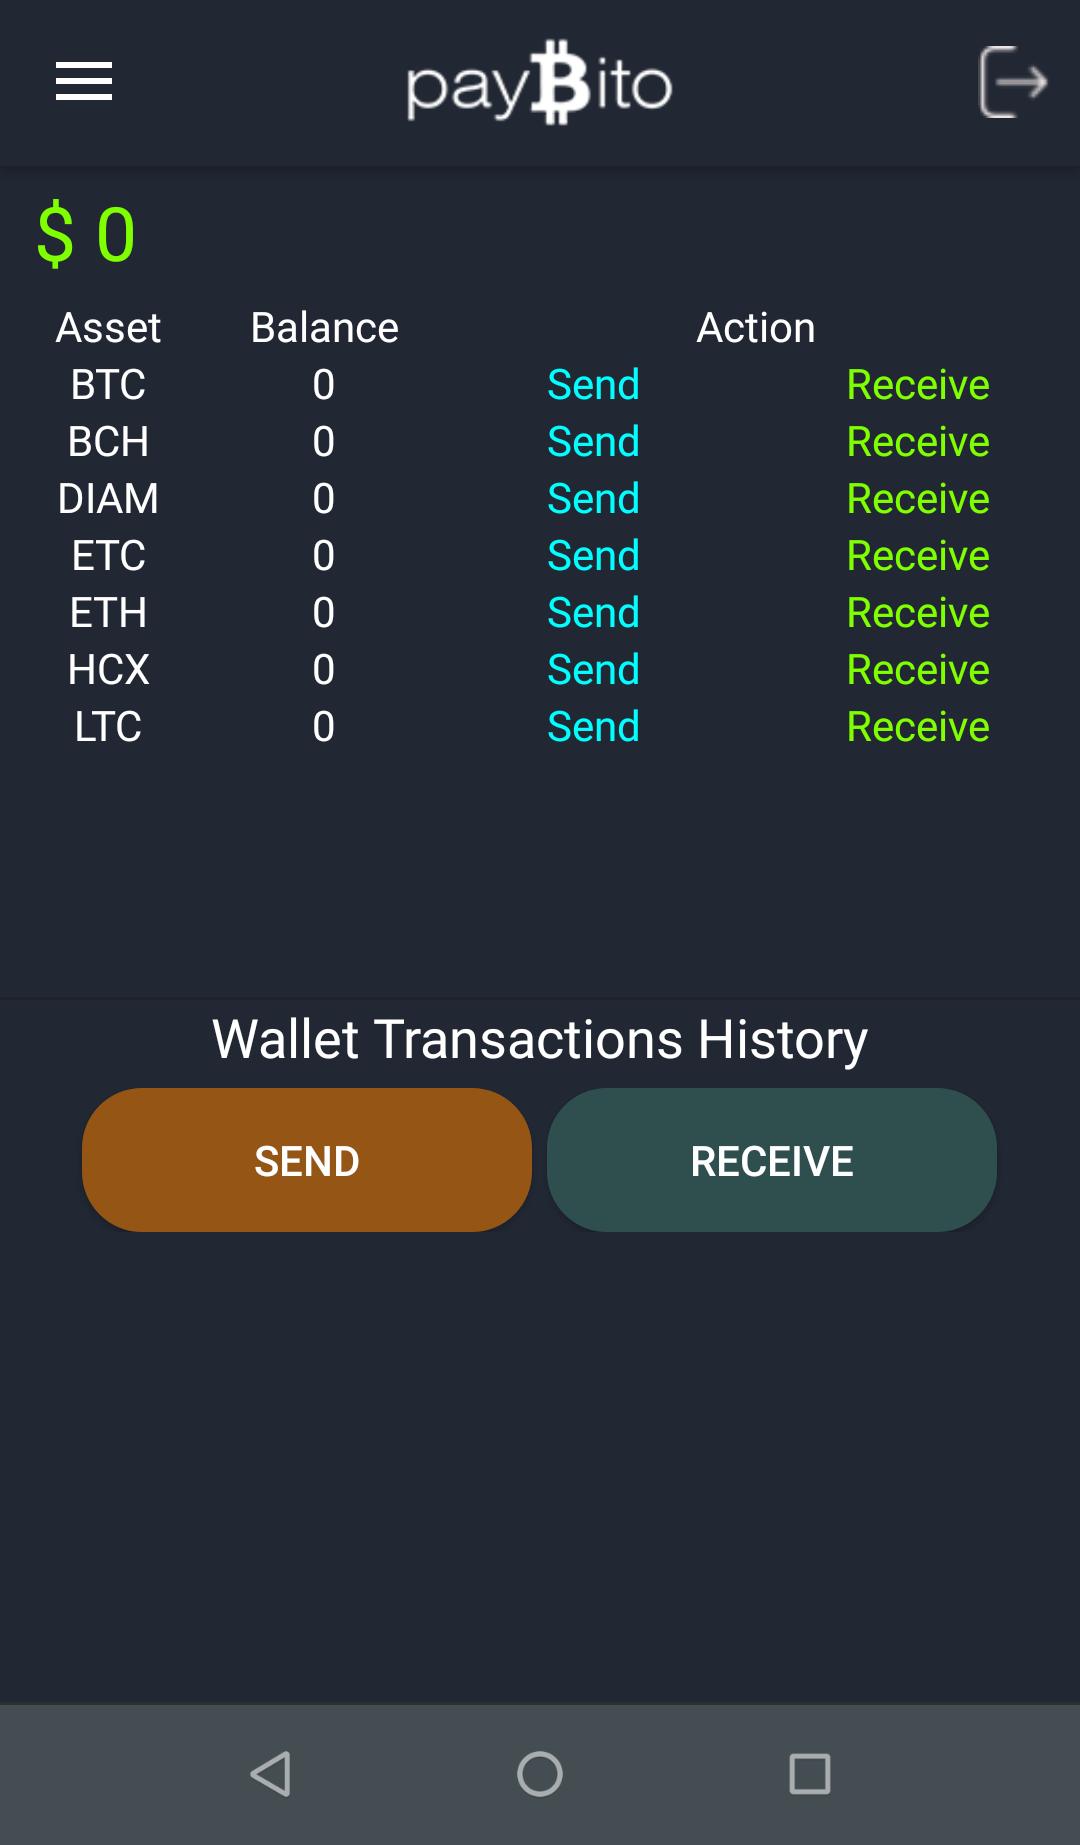 Paybito wallet